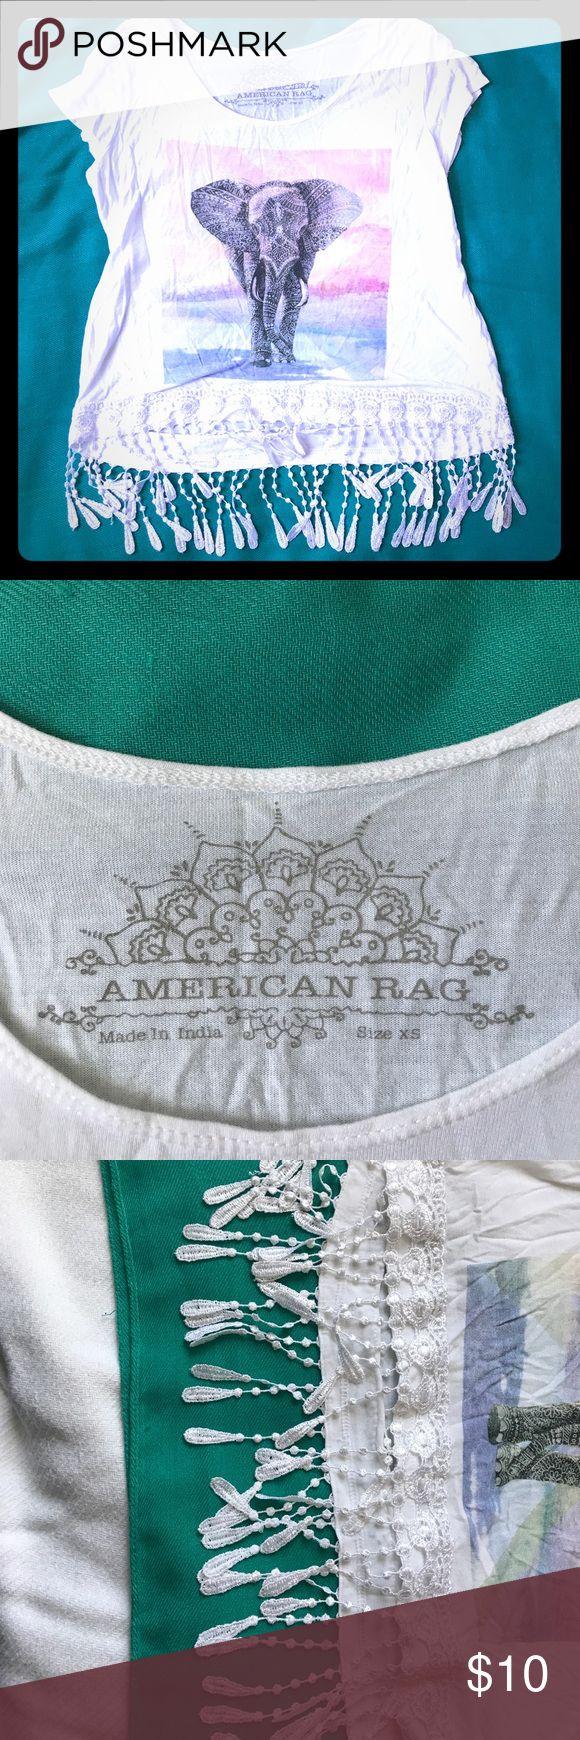 American Rag shirt XS American rag belly shirt American Rag Tops Crop Tops